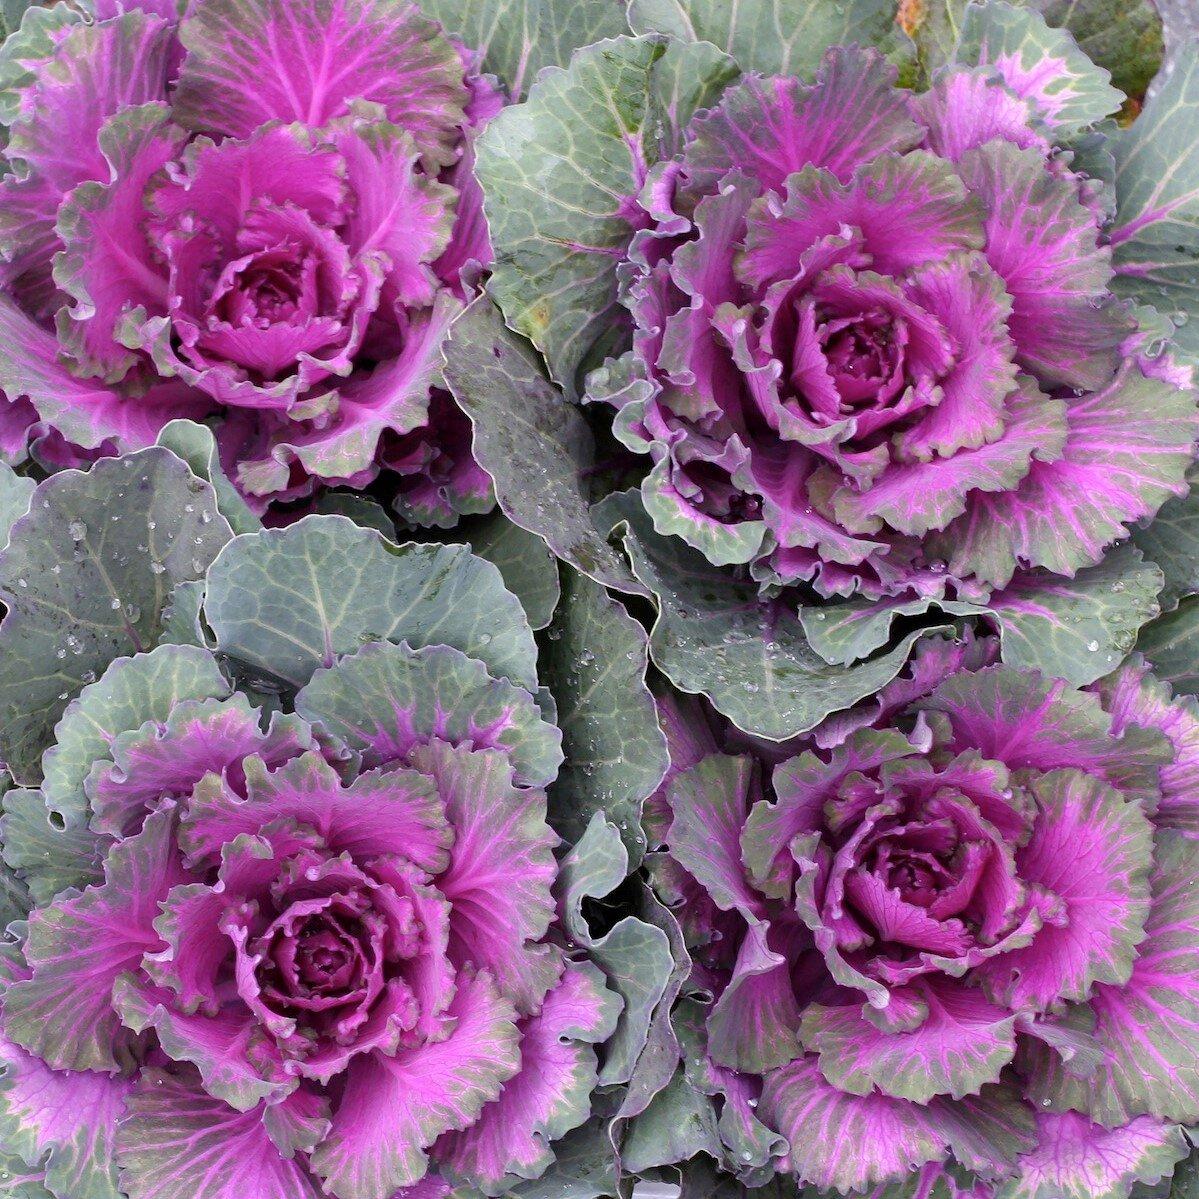 Ornamental Cabbage Cactus Tropicals